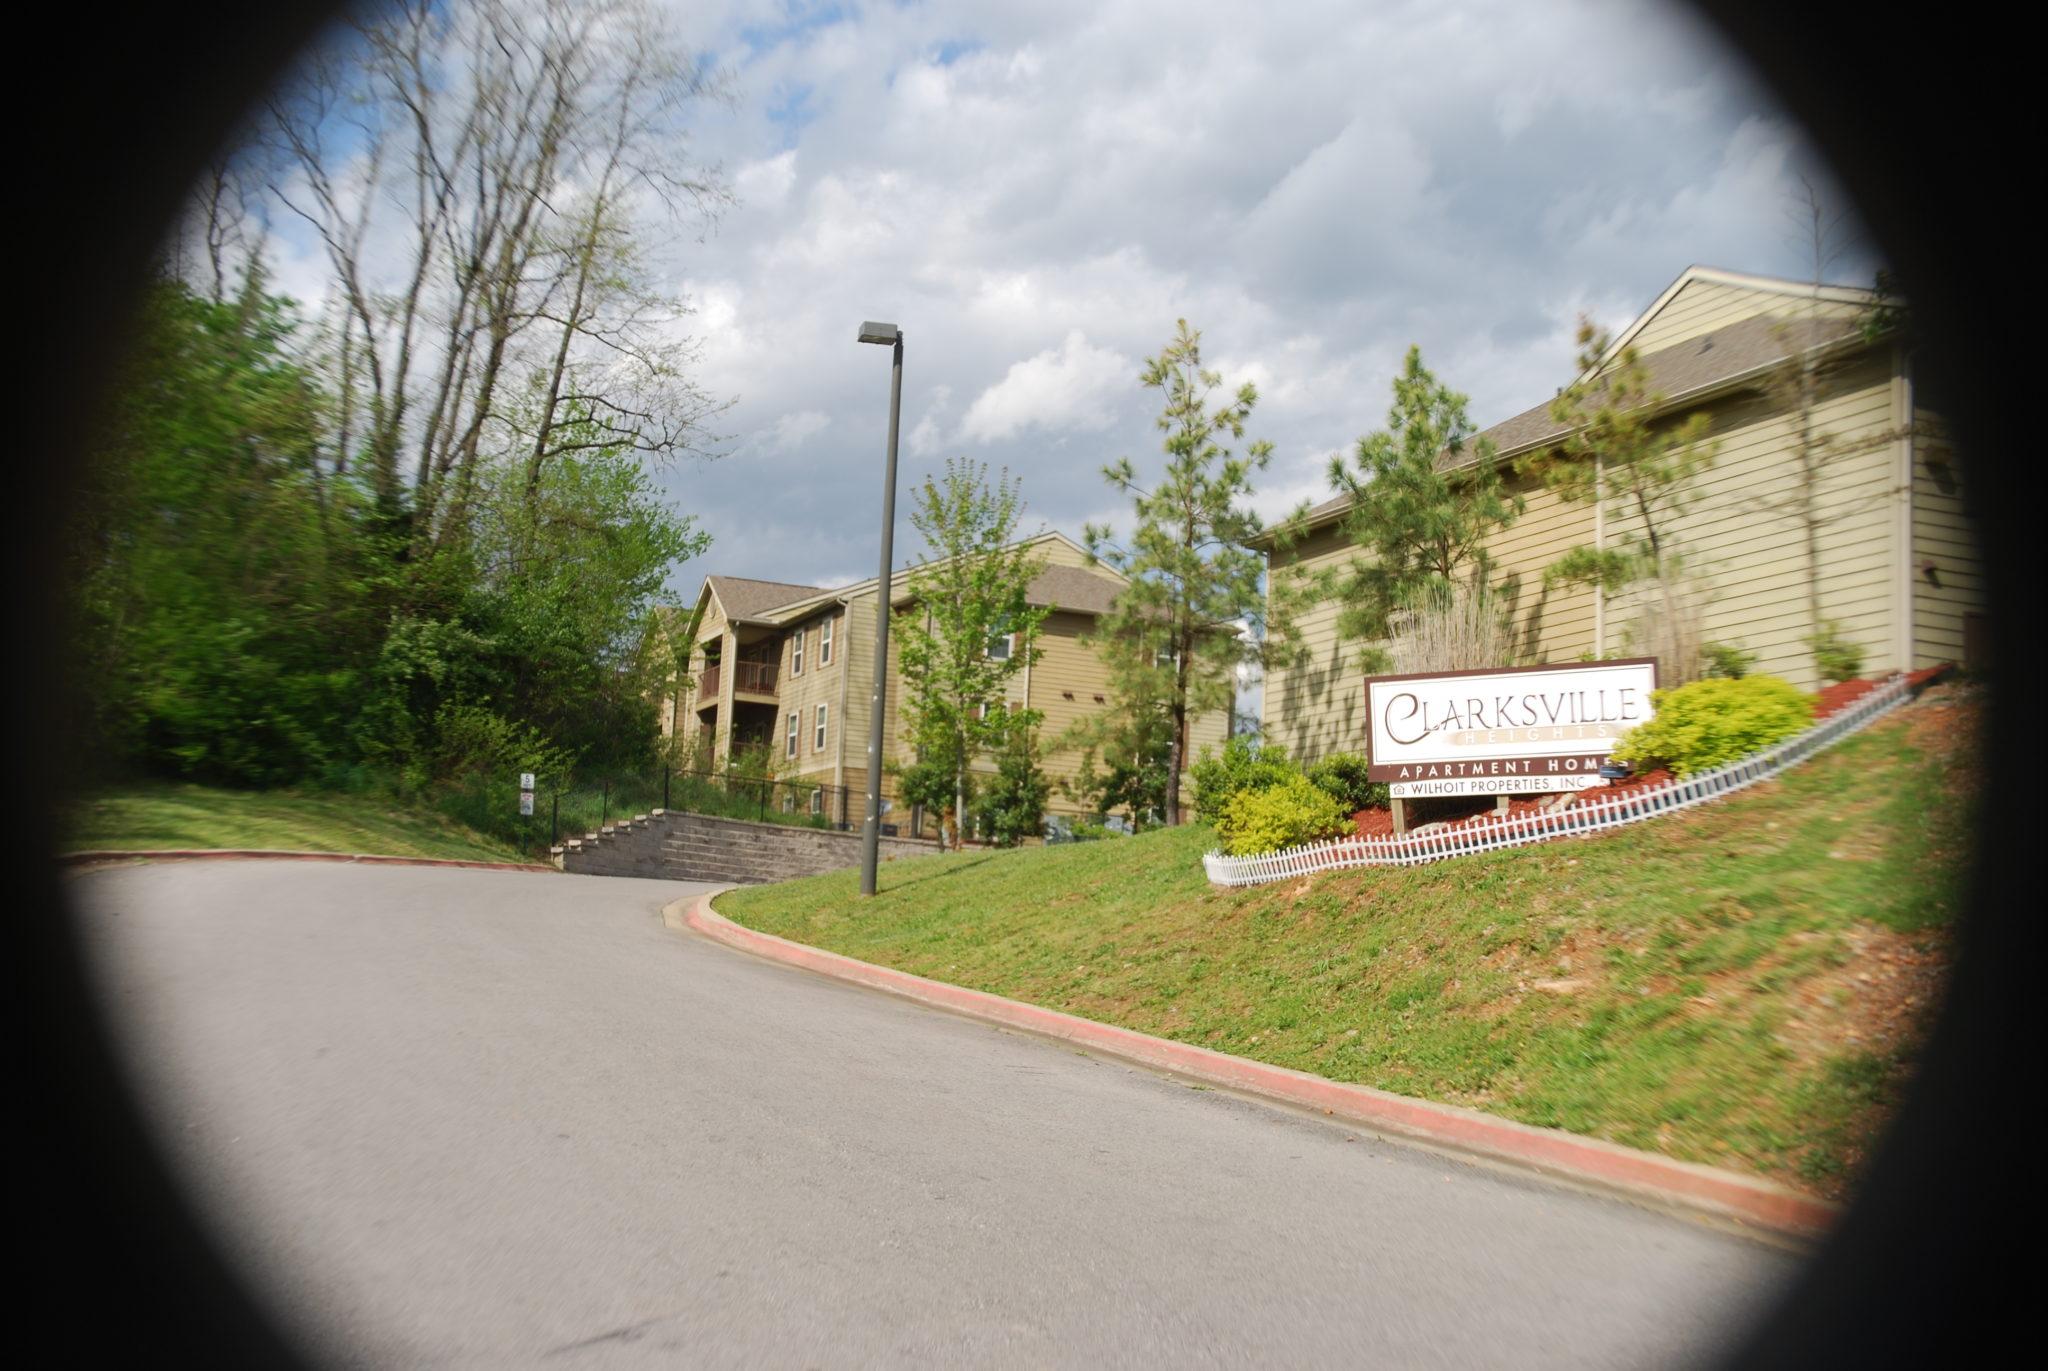 Clarksville-Heights-Clarksville-TN-sign-w-building-in-background